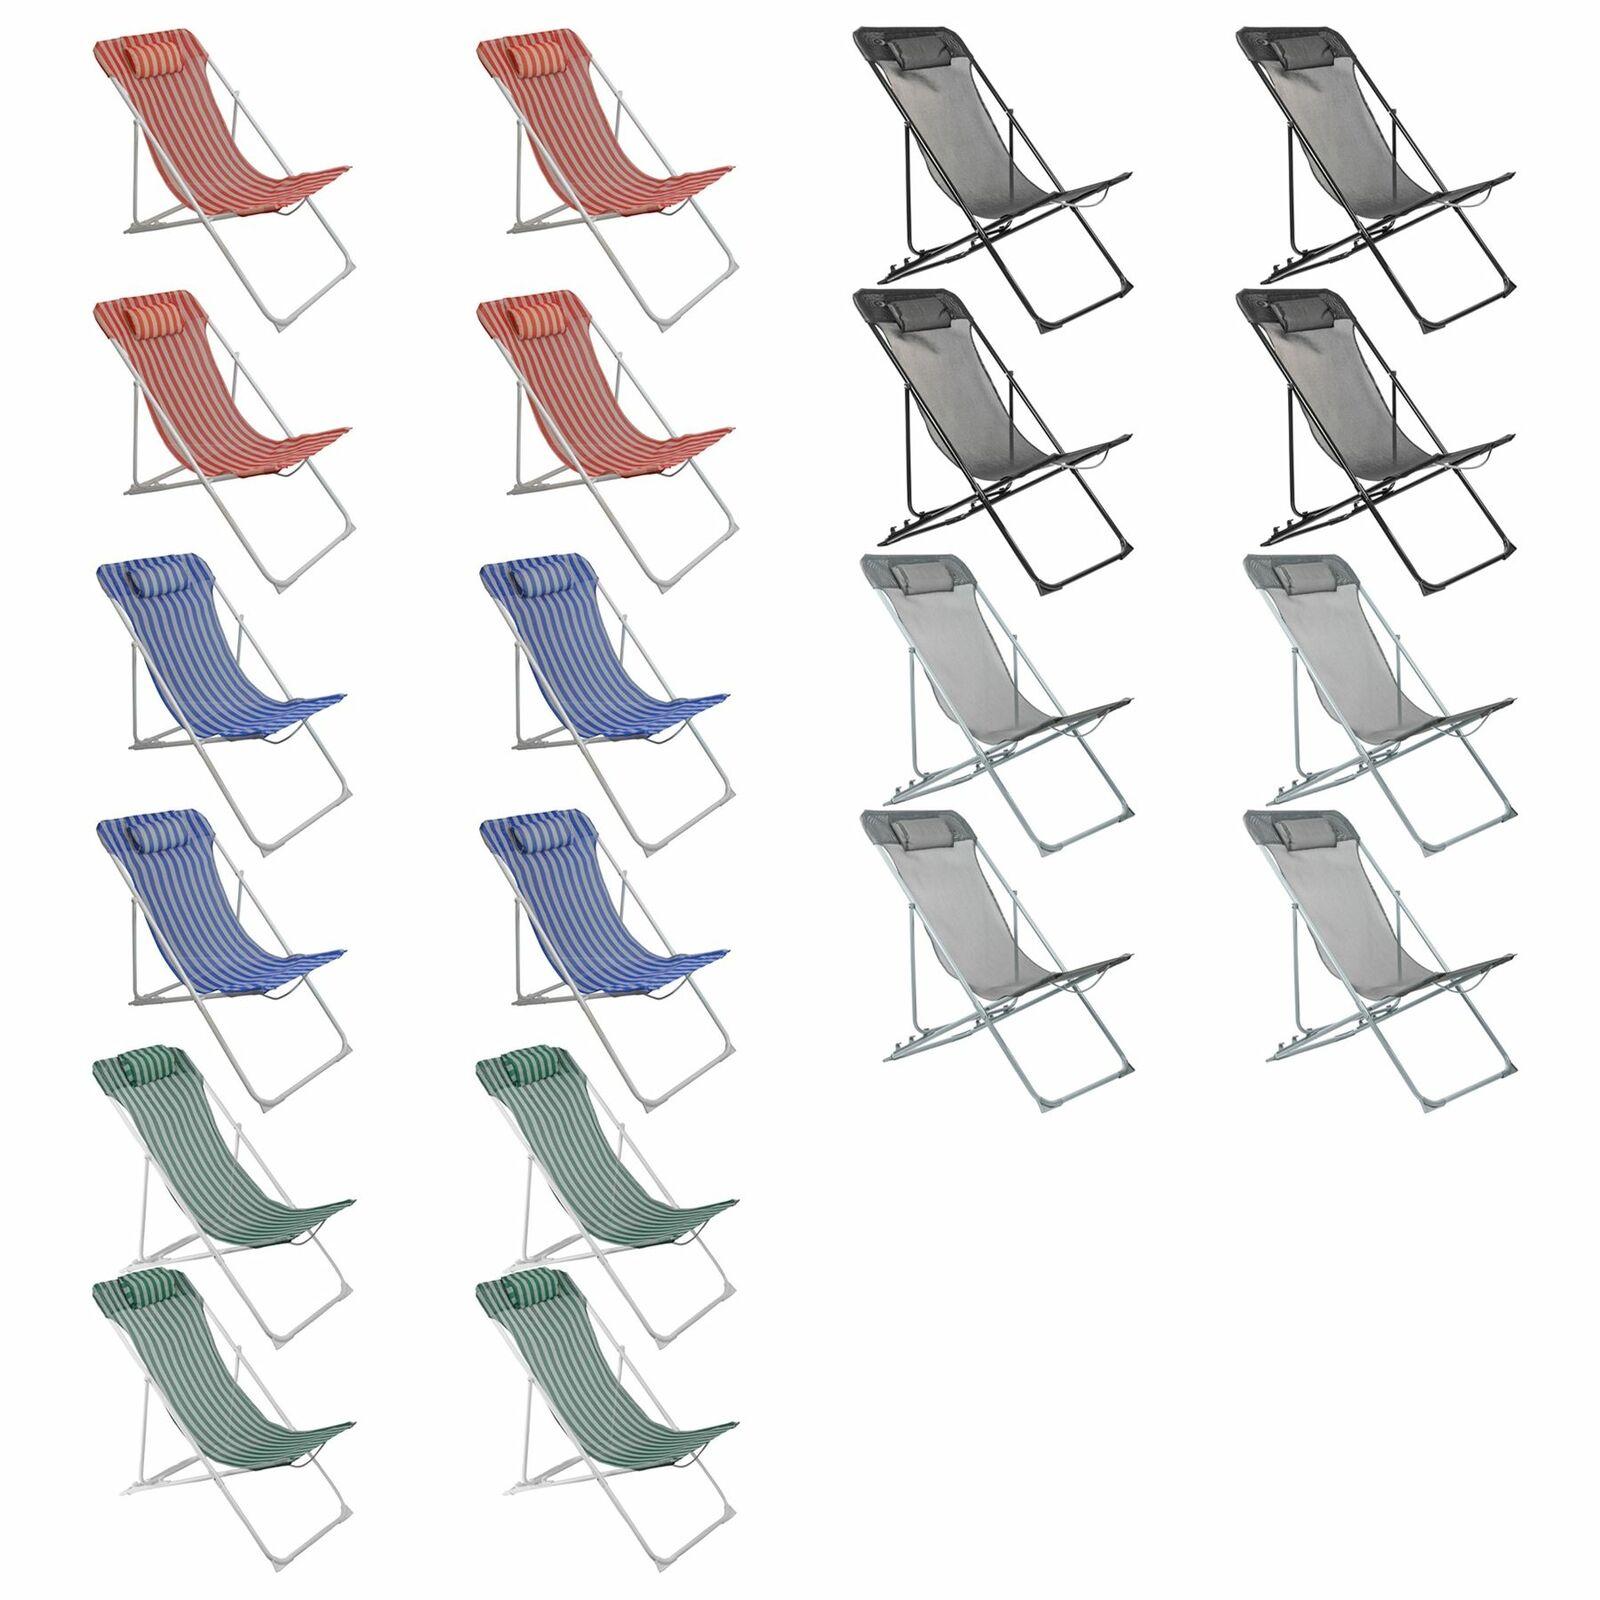 4x silla de cubierta jardín de metal ajustable REPOSACABEZAS Portátil Plegable